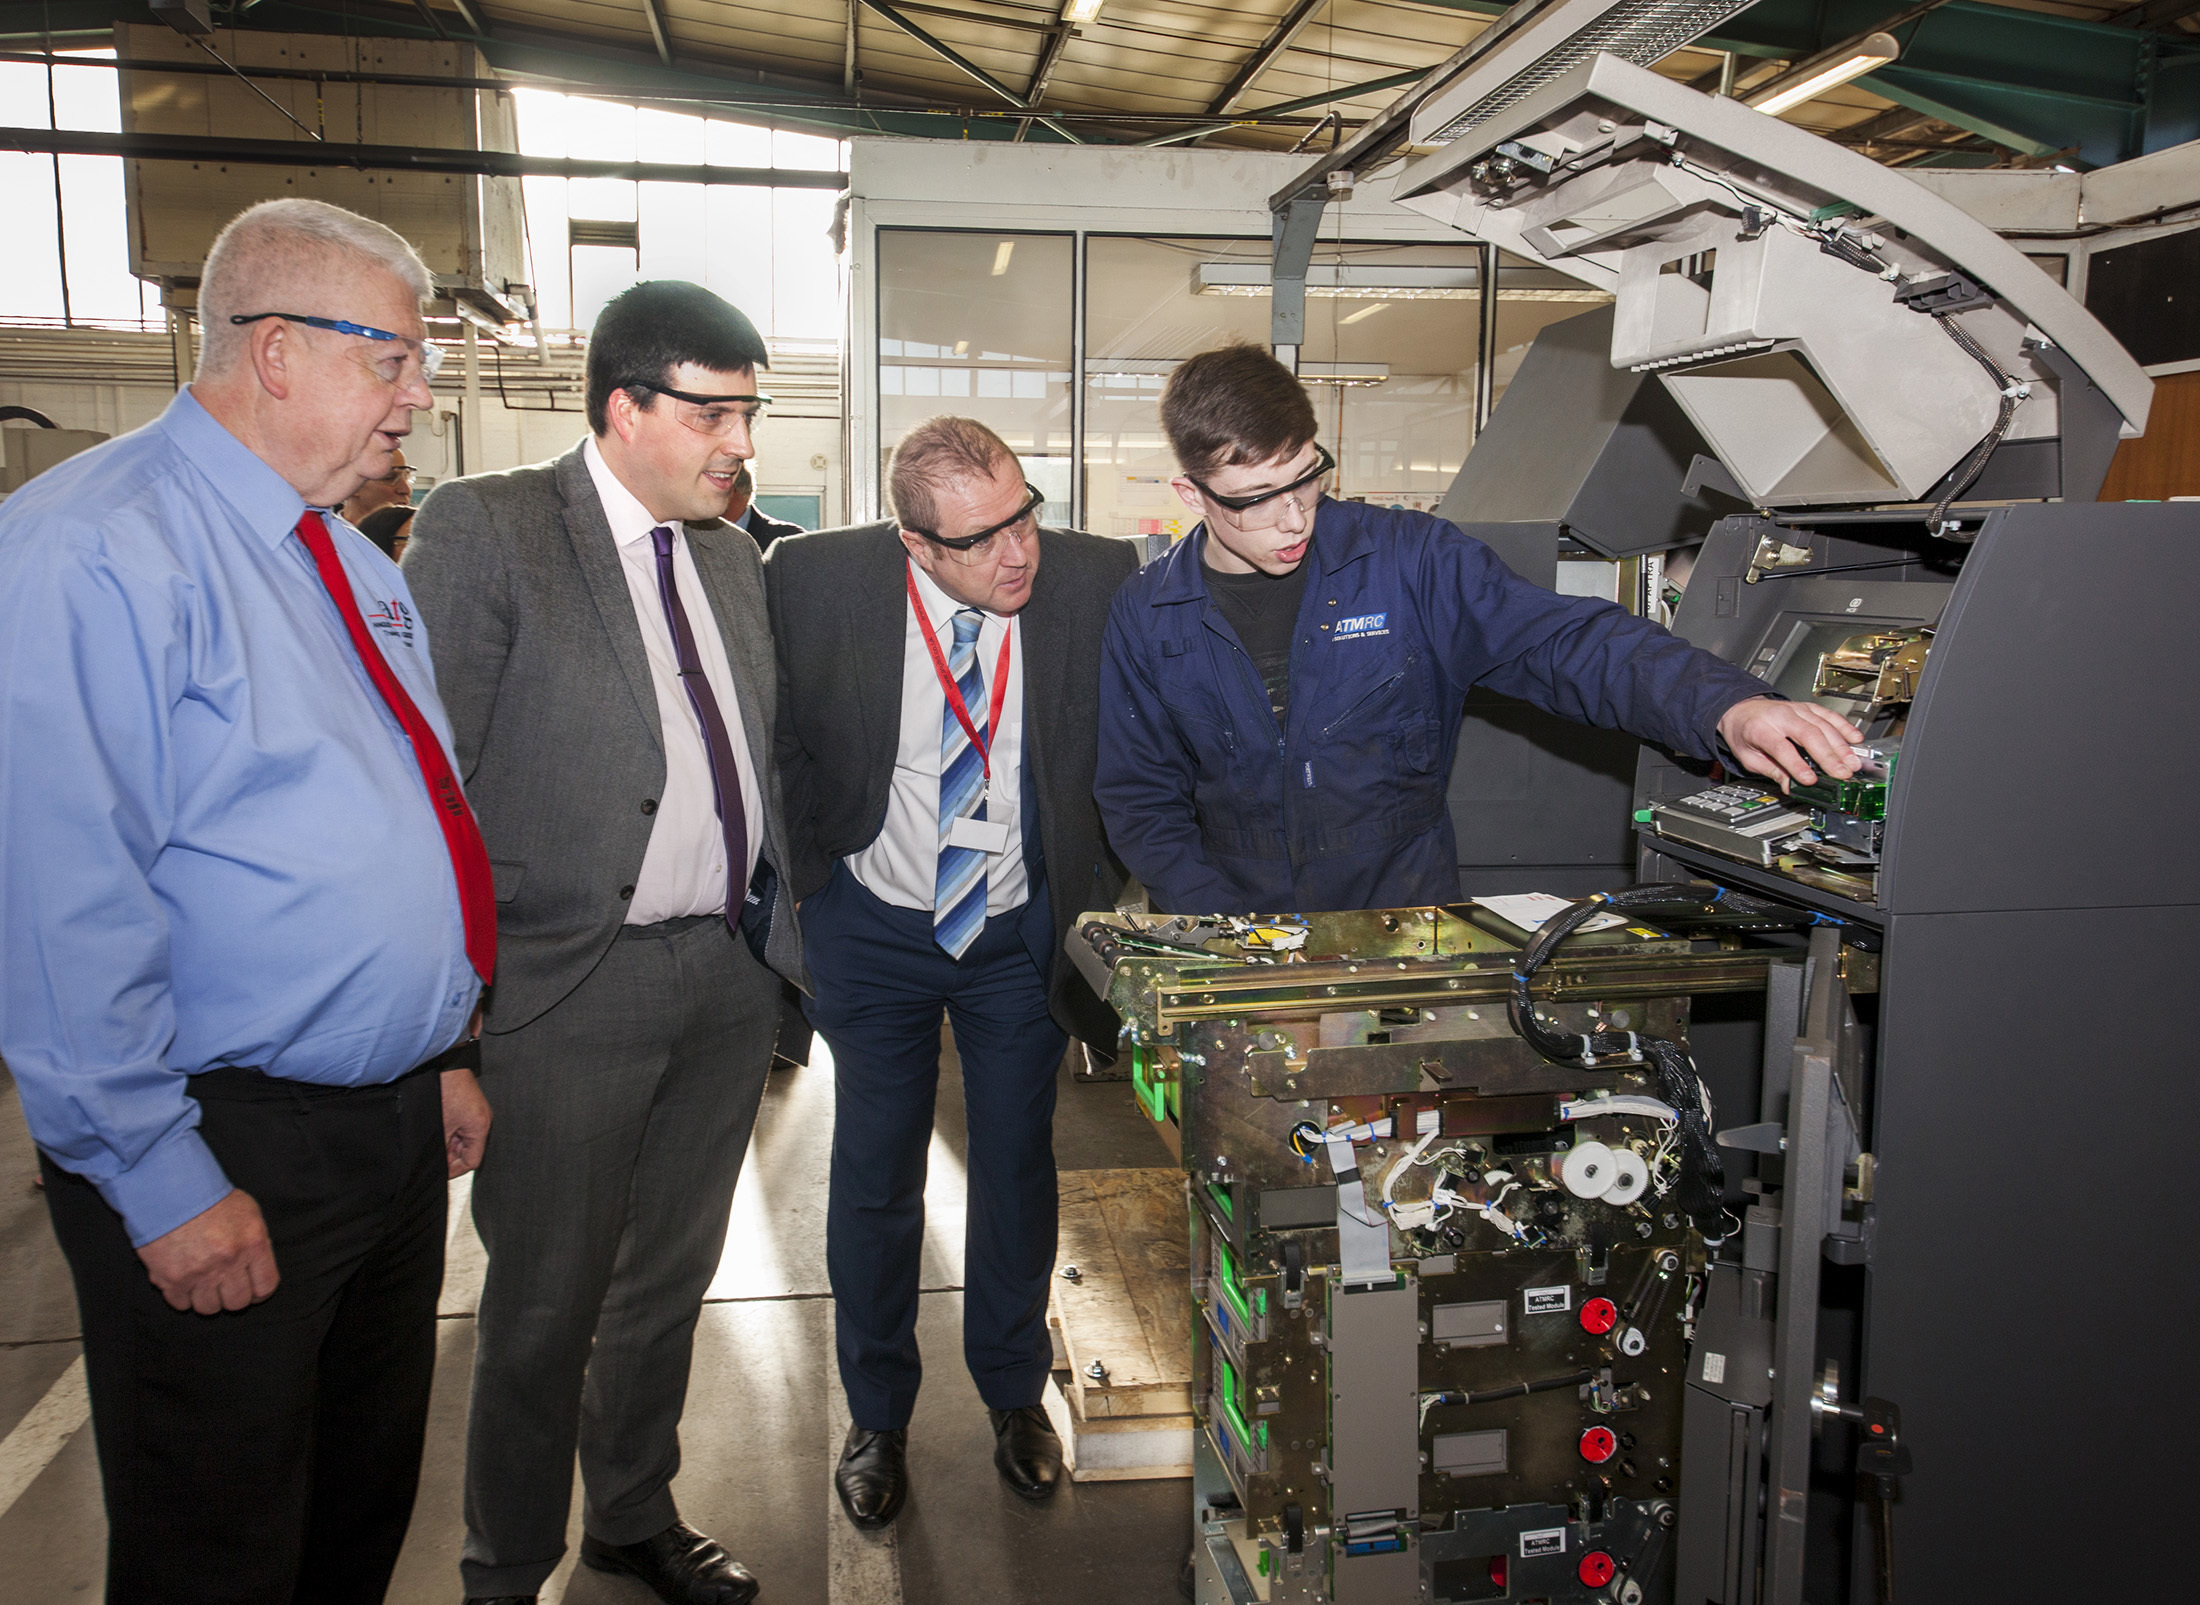 General manager Gary Talbot, Jamie Hepburn and Graeme Dey watch apprentice Flynn Suggett working on an ATM.